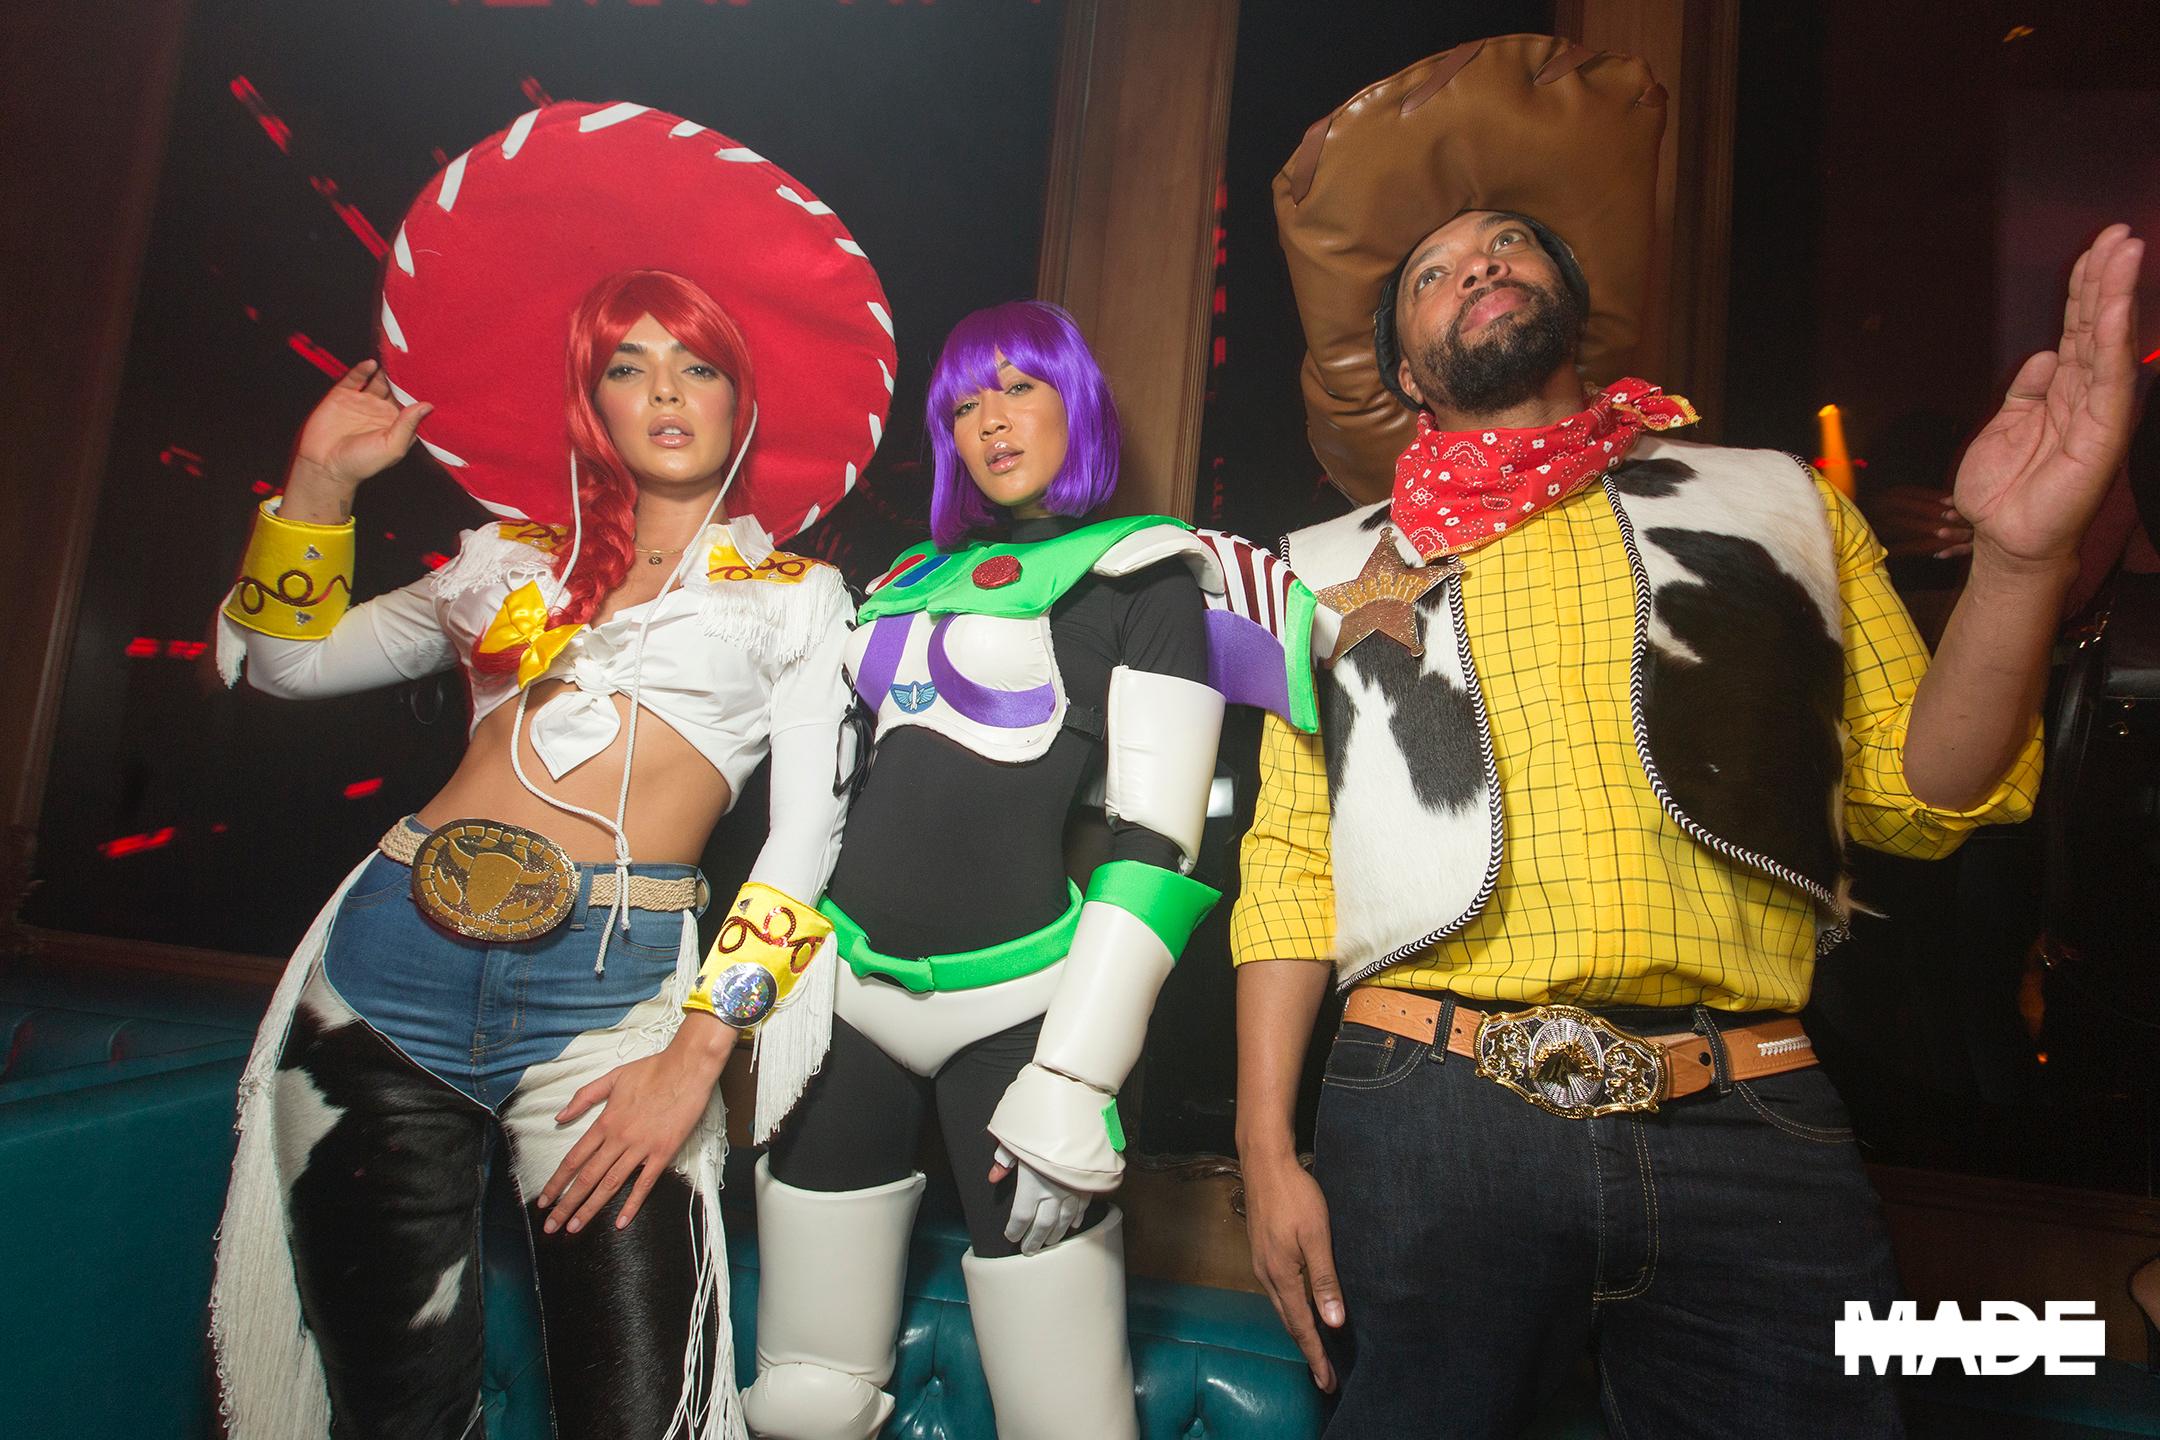 halloween at avenue nightclub (3).jpg